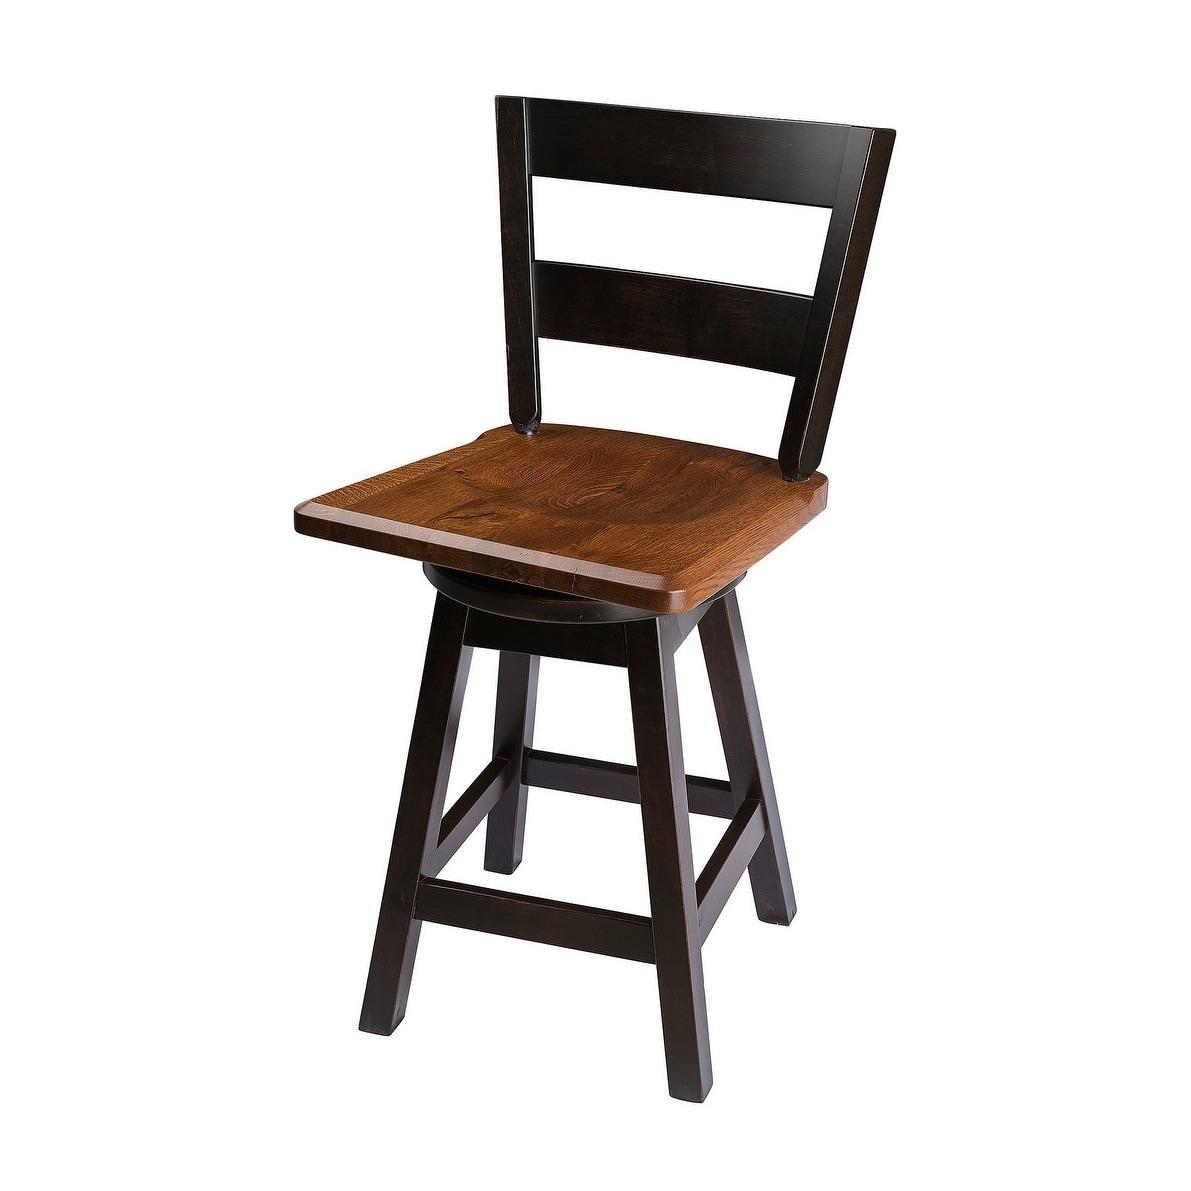 Pleasing Swivel Bar Stool With Straight Back In Quarter Sawn Oak Wood Lamtechconsult Wood Chair Design Ideas Lamtechconsultcom